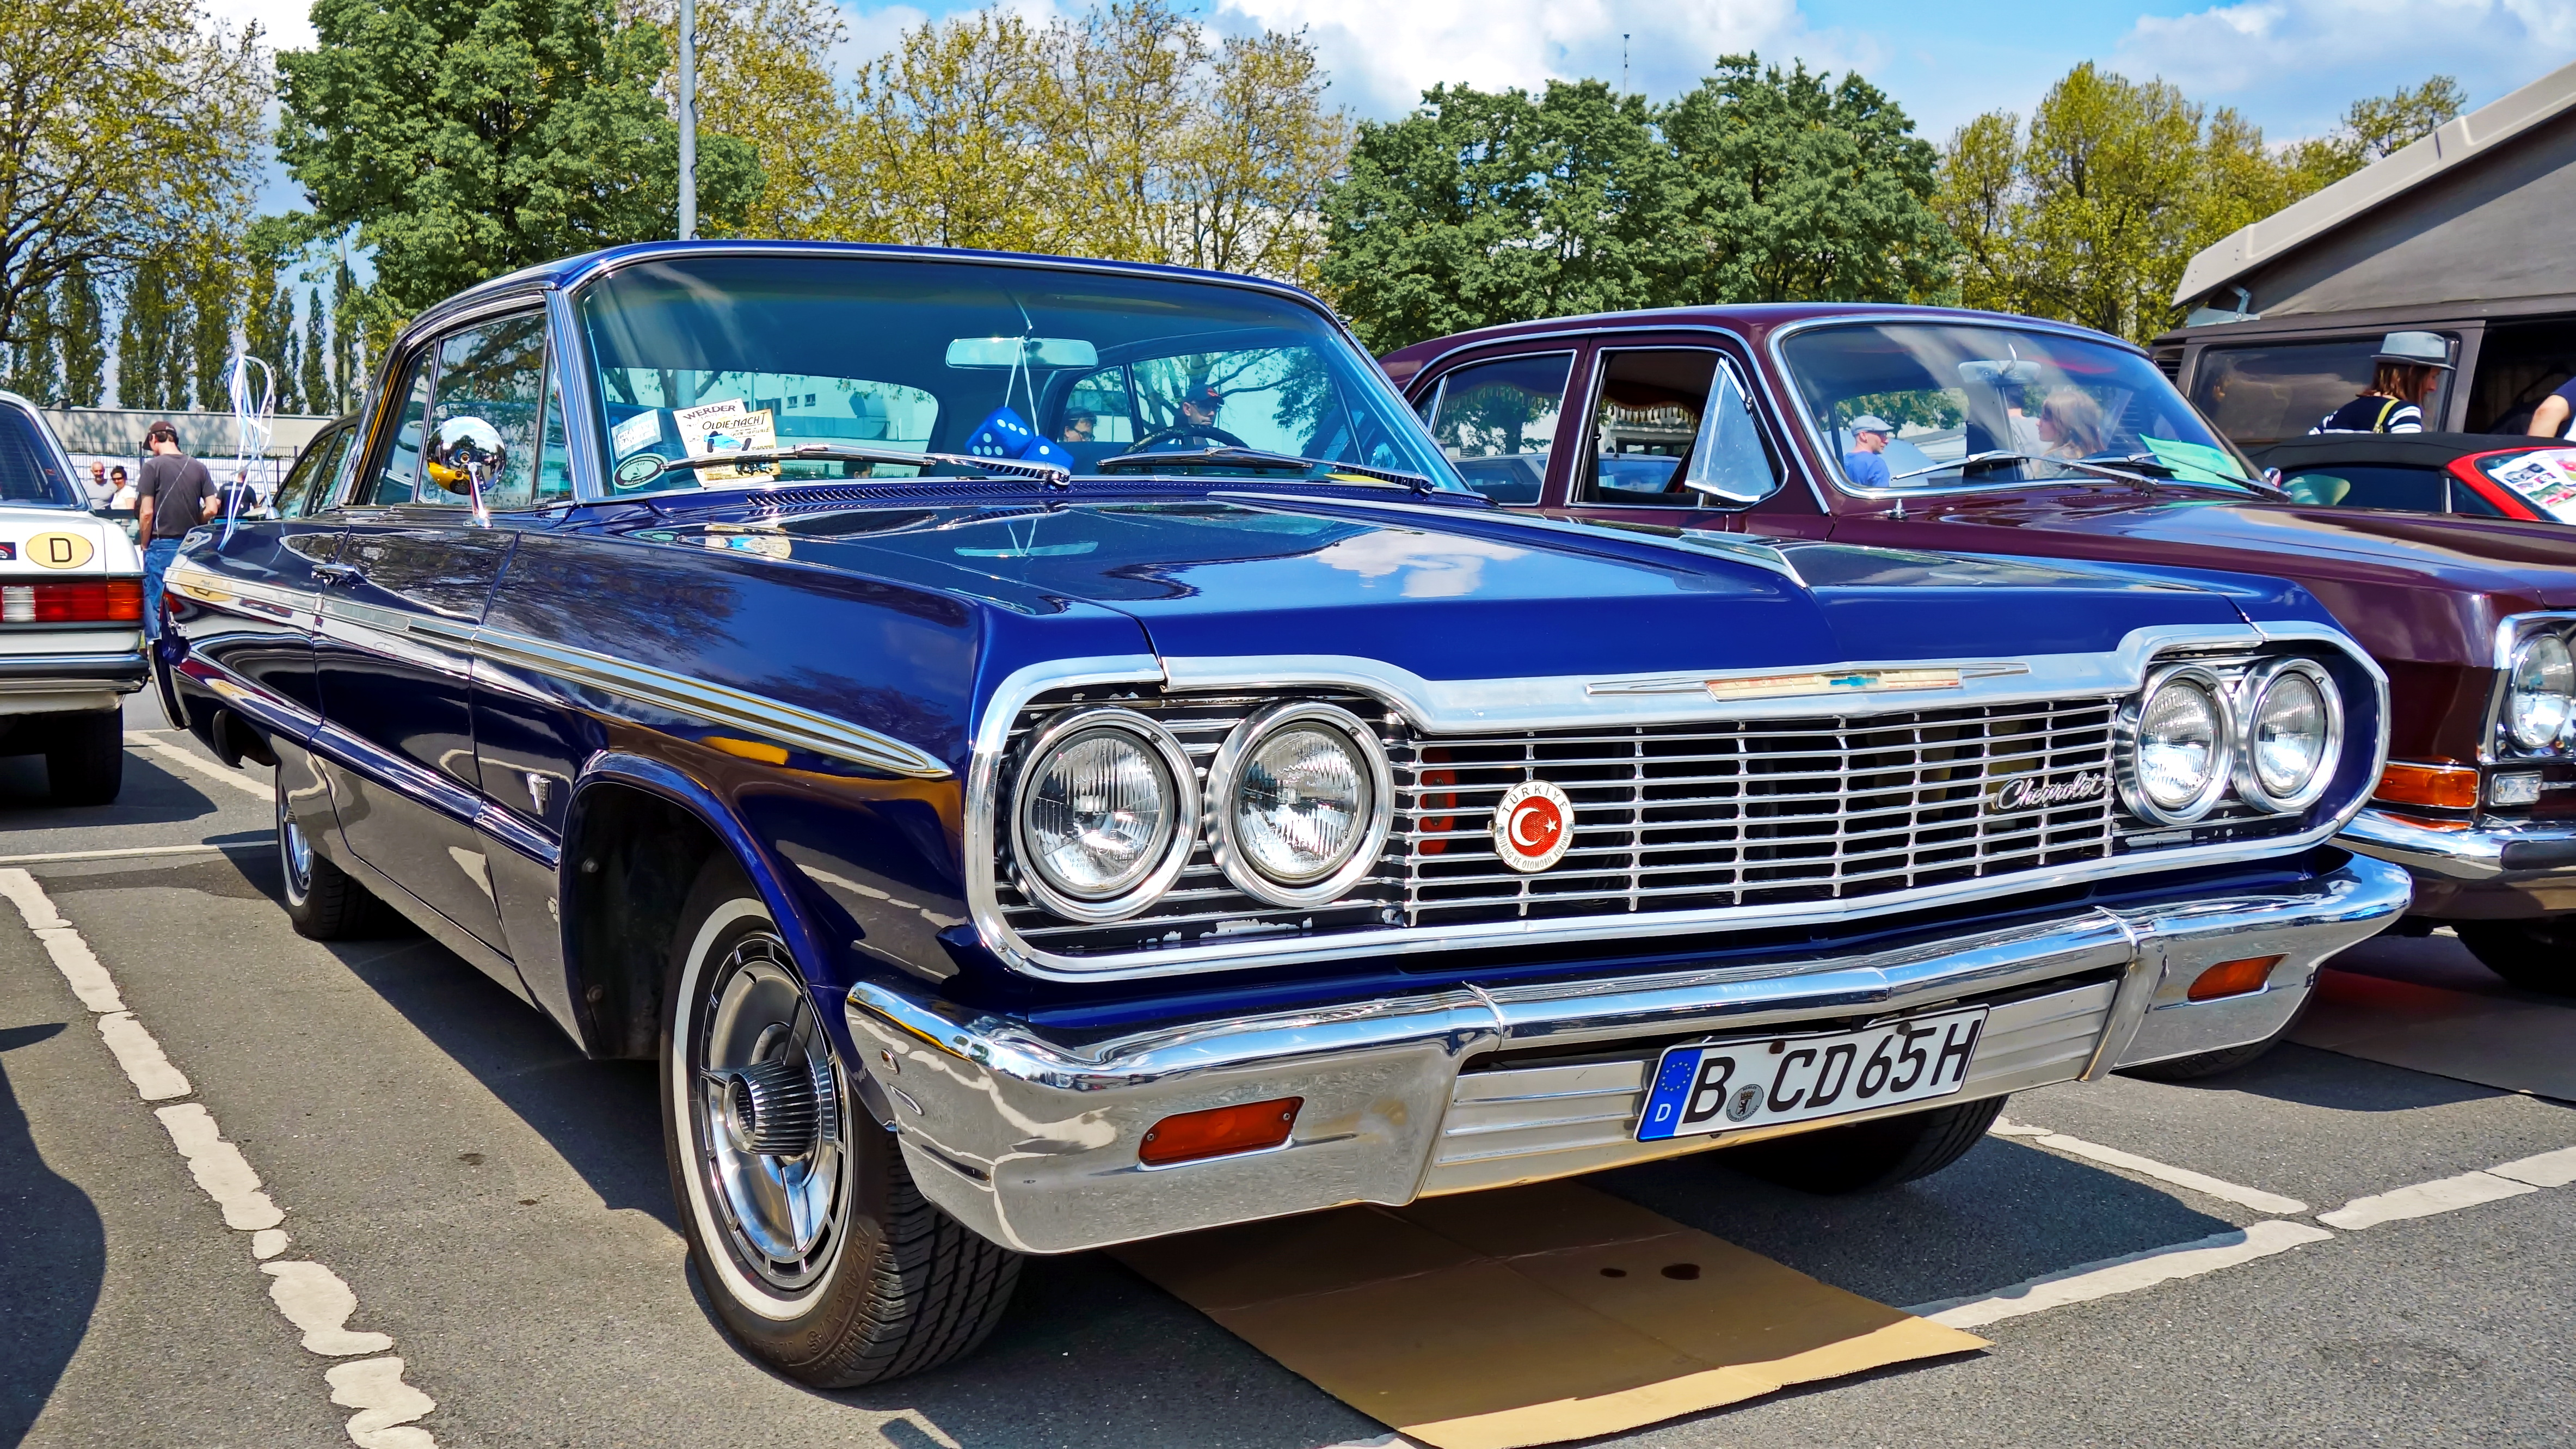 Kekurangan Chevrolet Impala 64 Spesifikasi